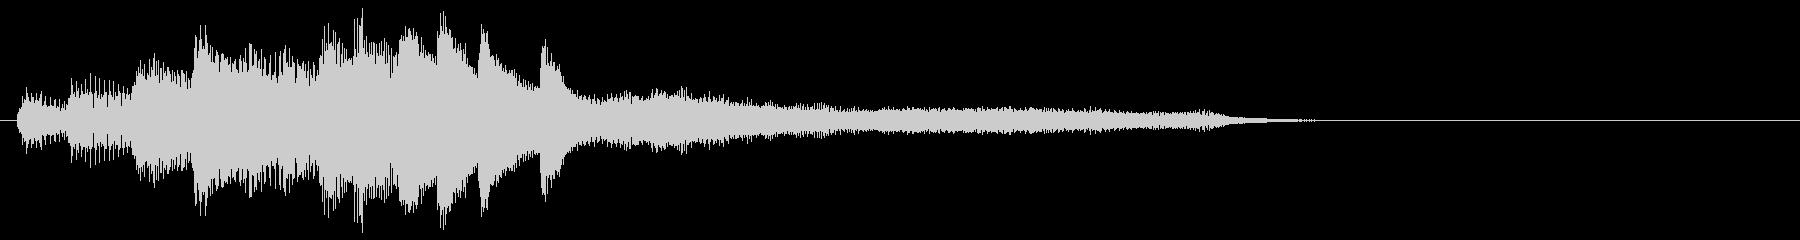 タラララララララ~(ピアノ)_01の未再生の波形